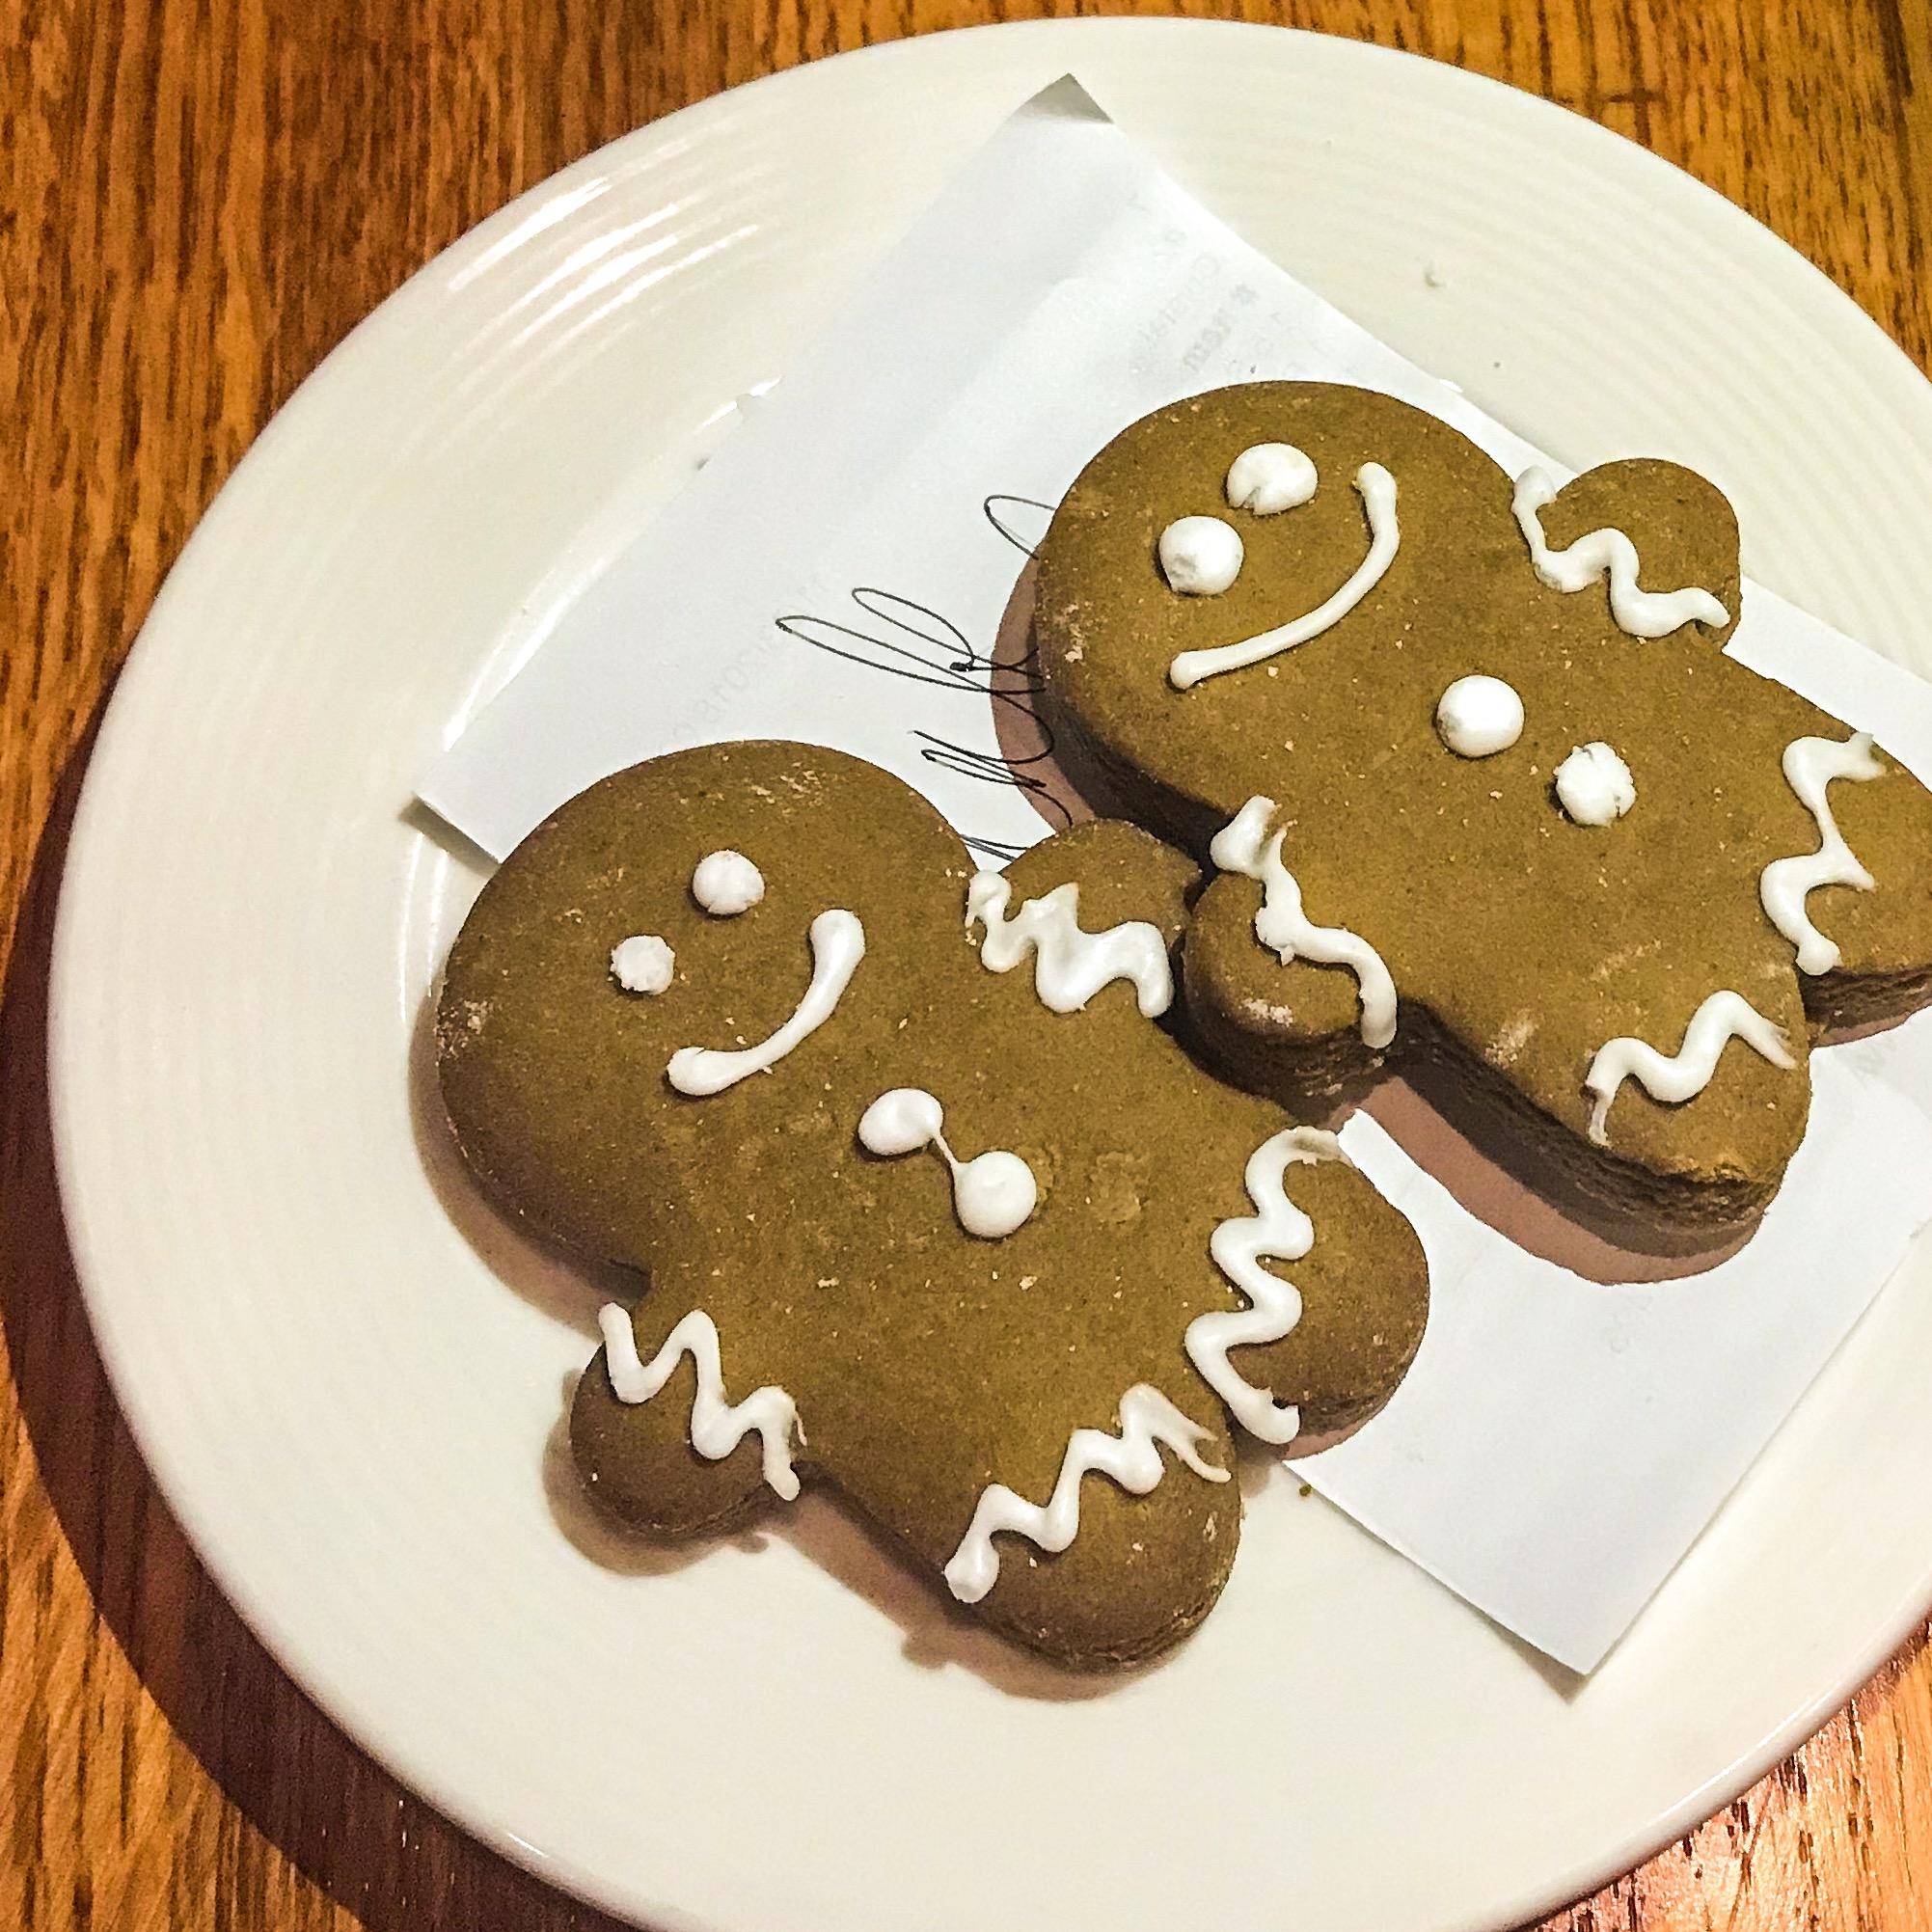 gingerbread man.jpg